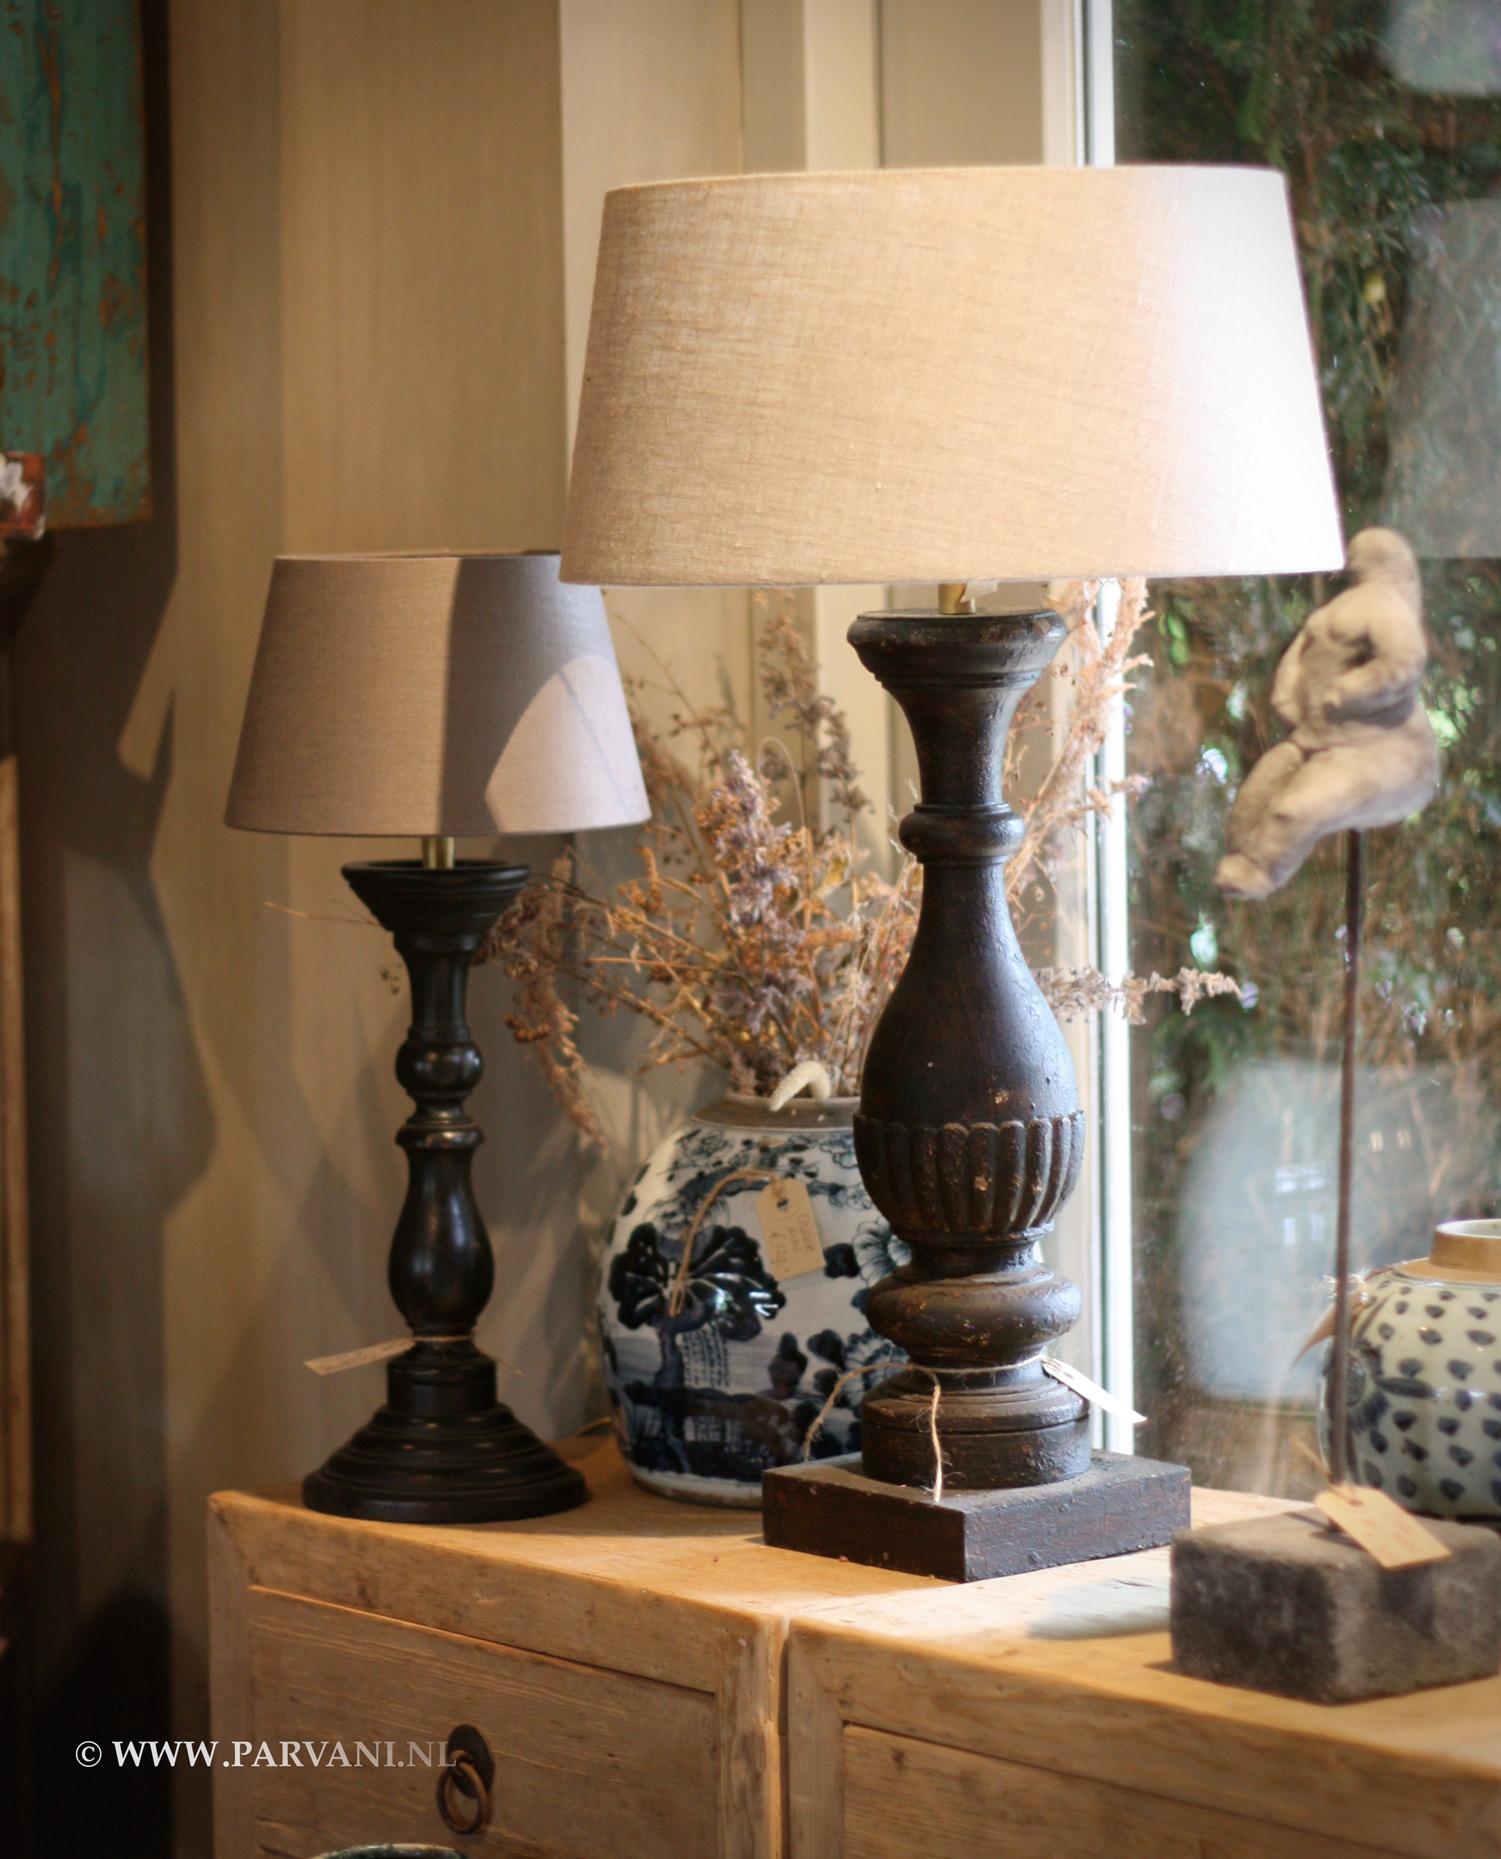 Parvani schemerlamp houten voet baluster - Houten drie voet lamp ...